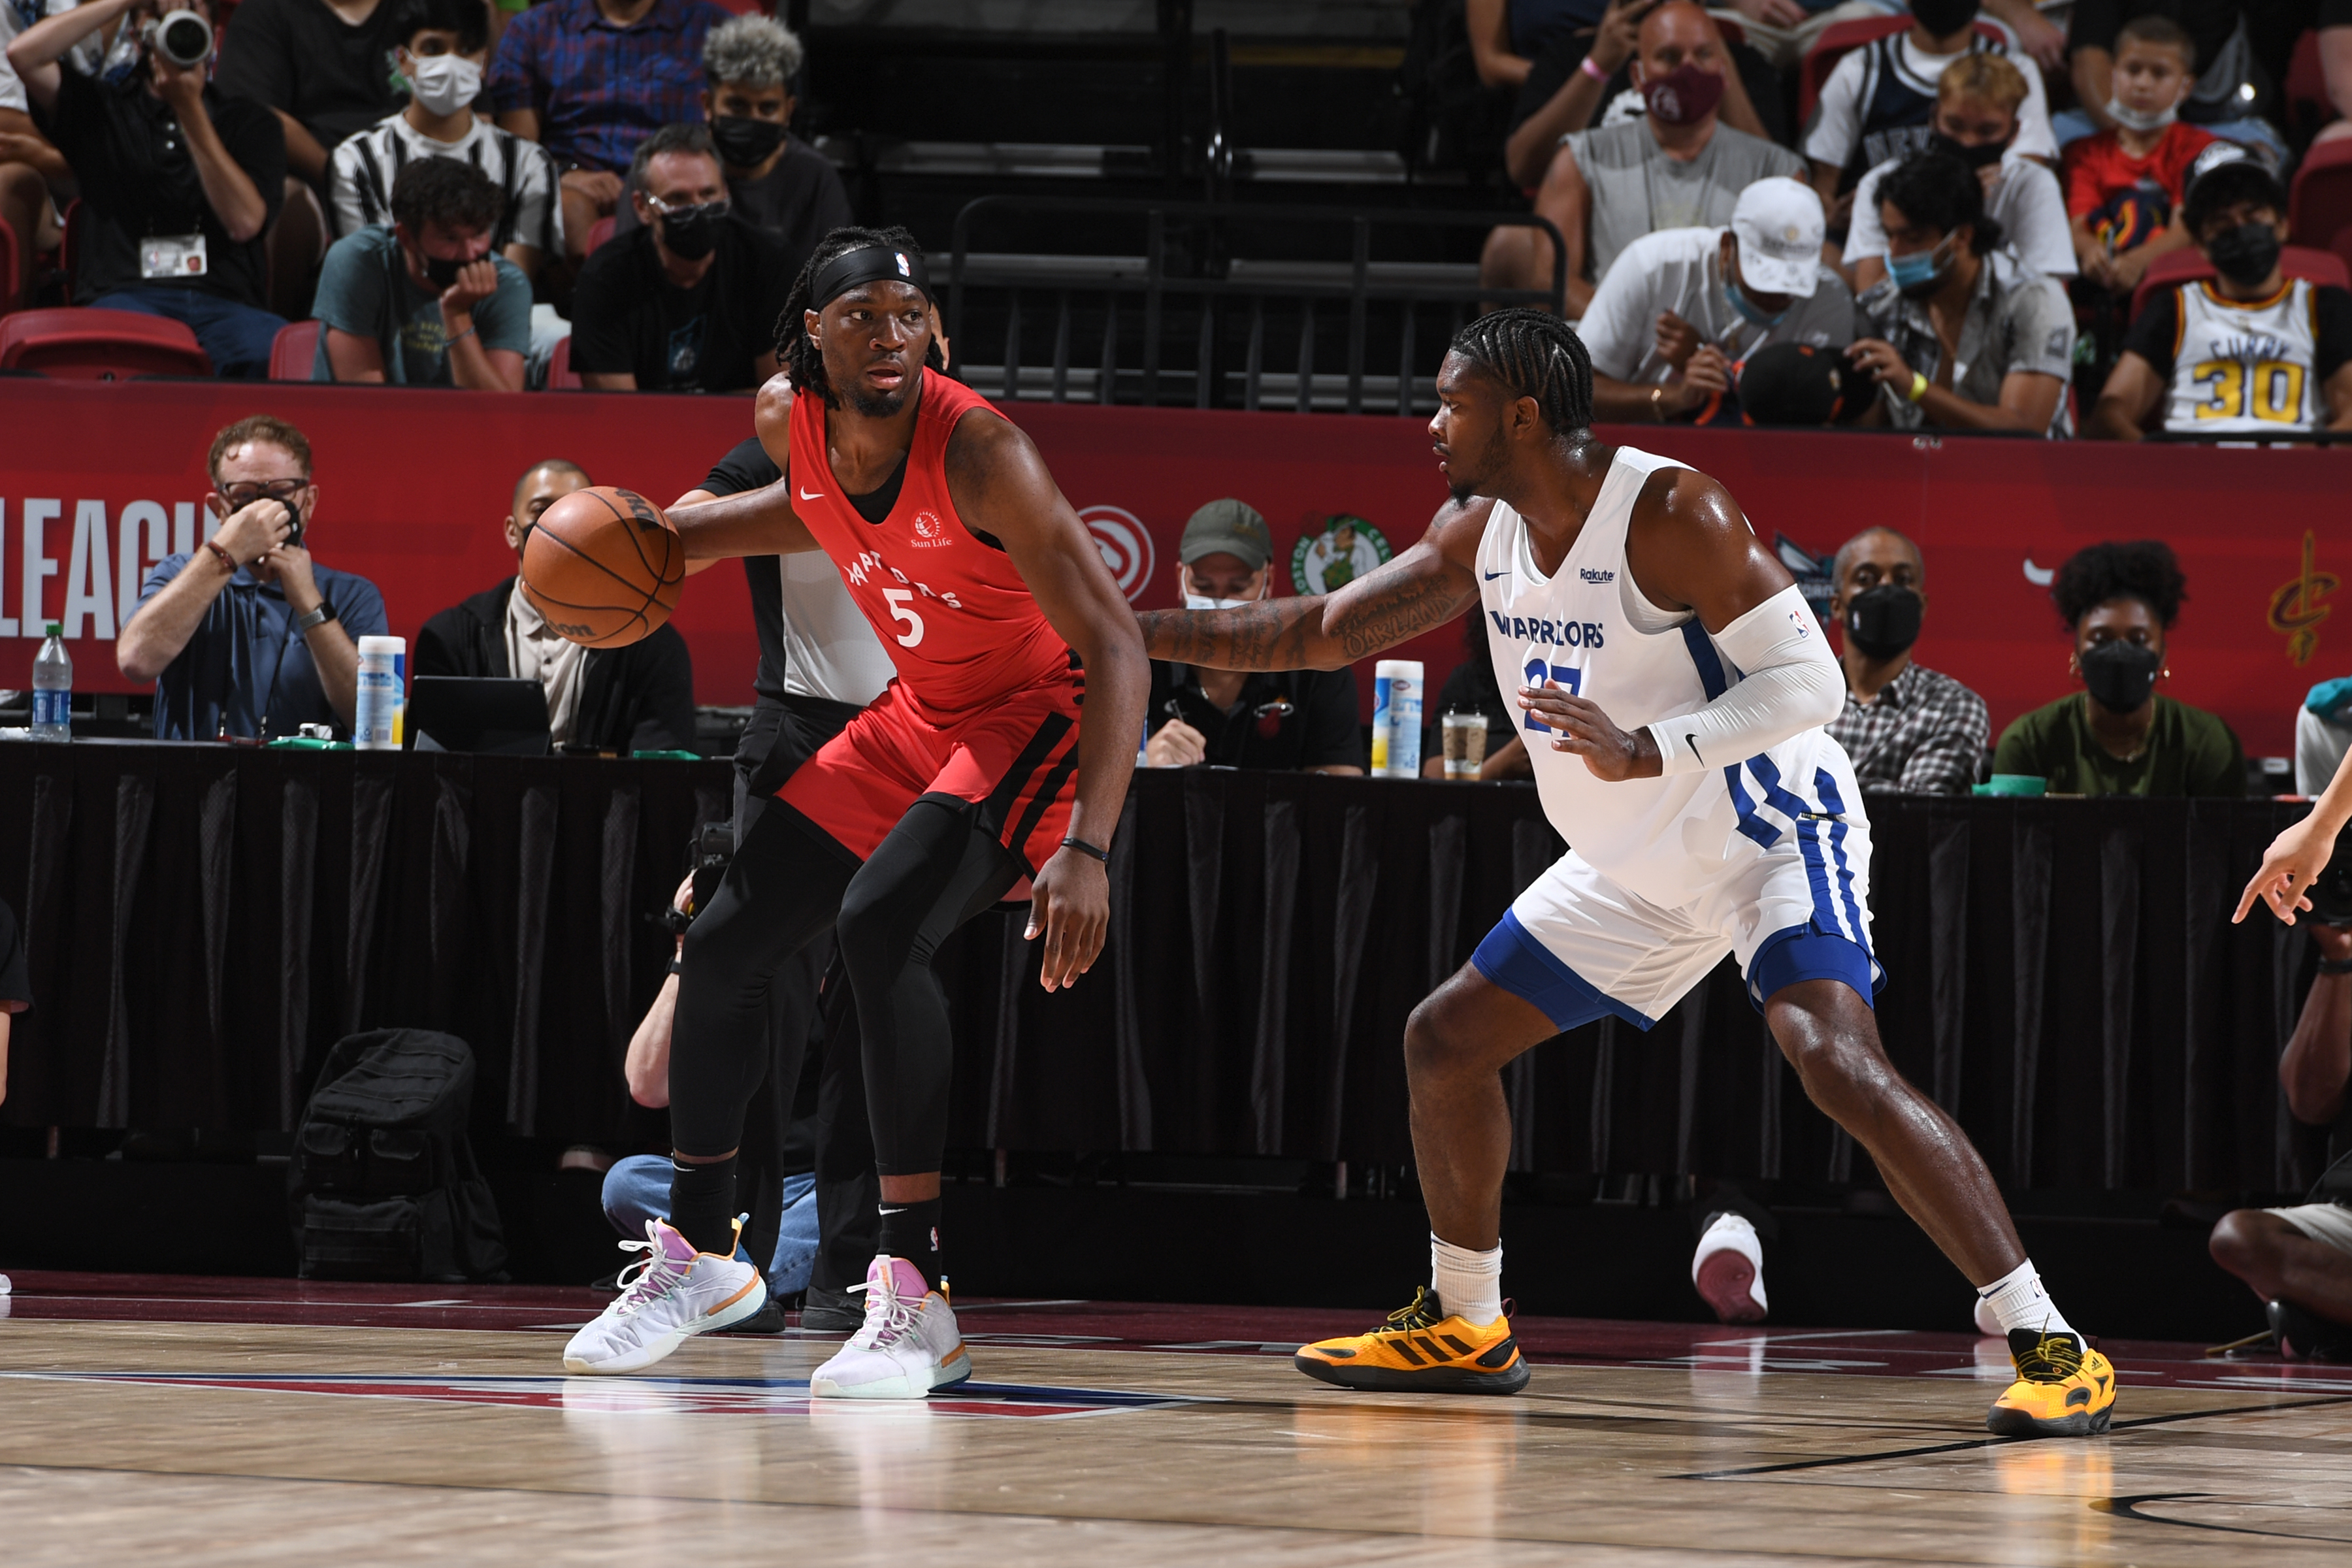 2021 Las Vegas Summer League - Toronto Raptors v Golden State Warriors